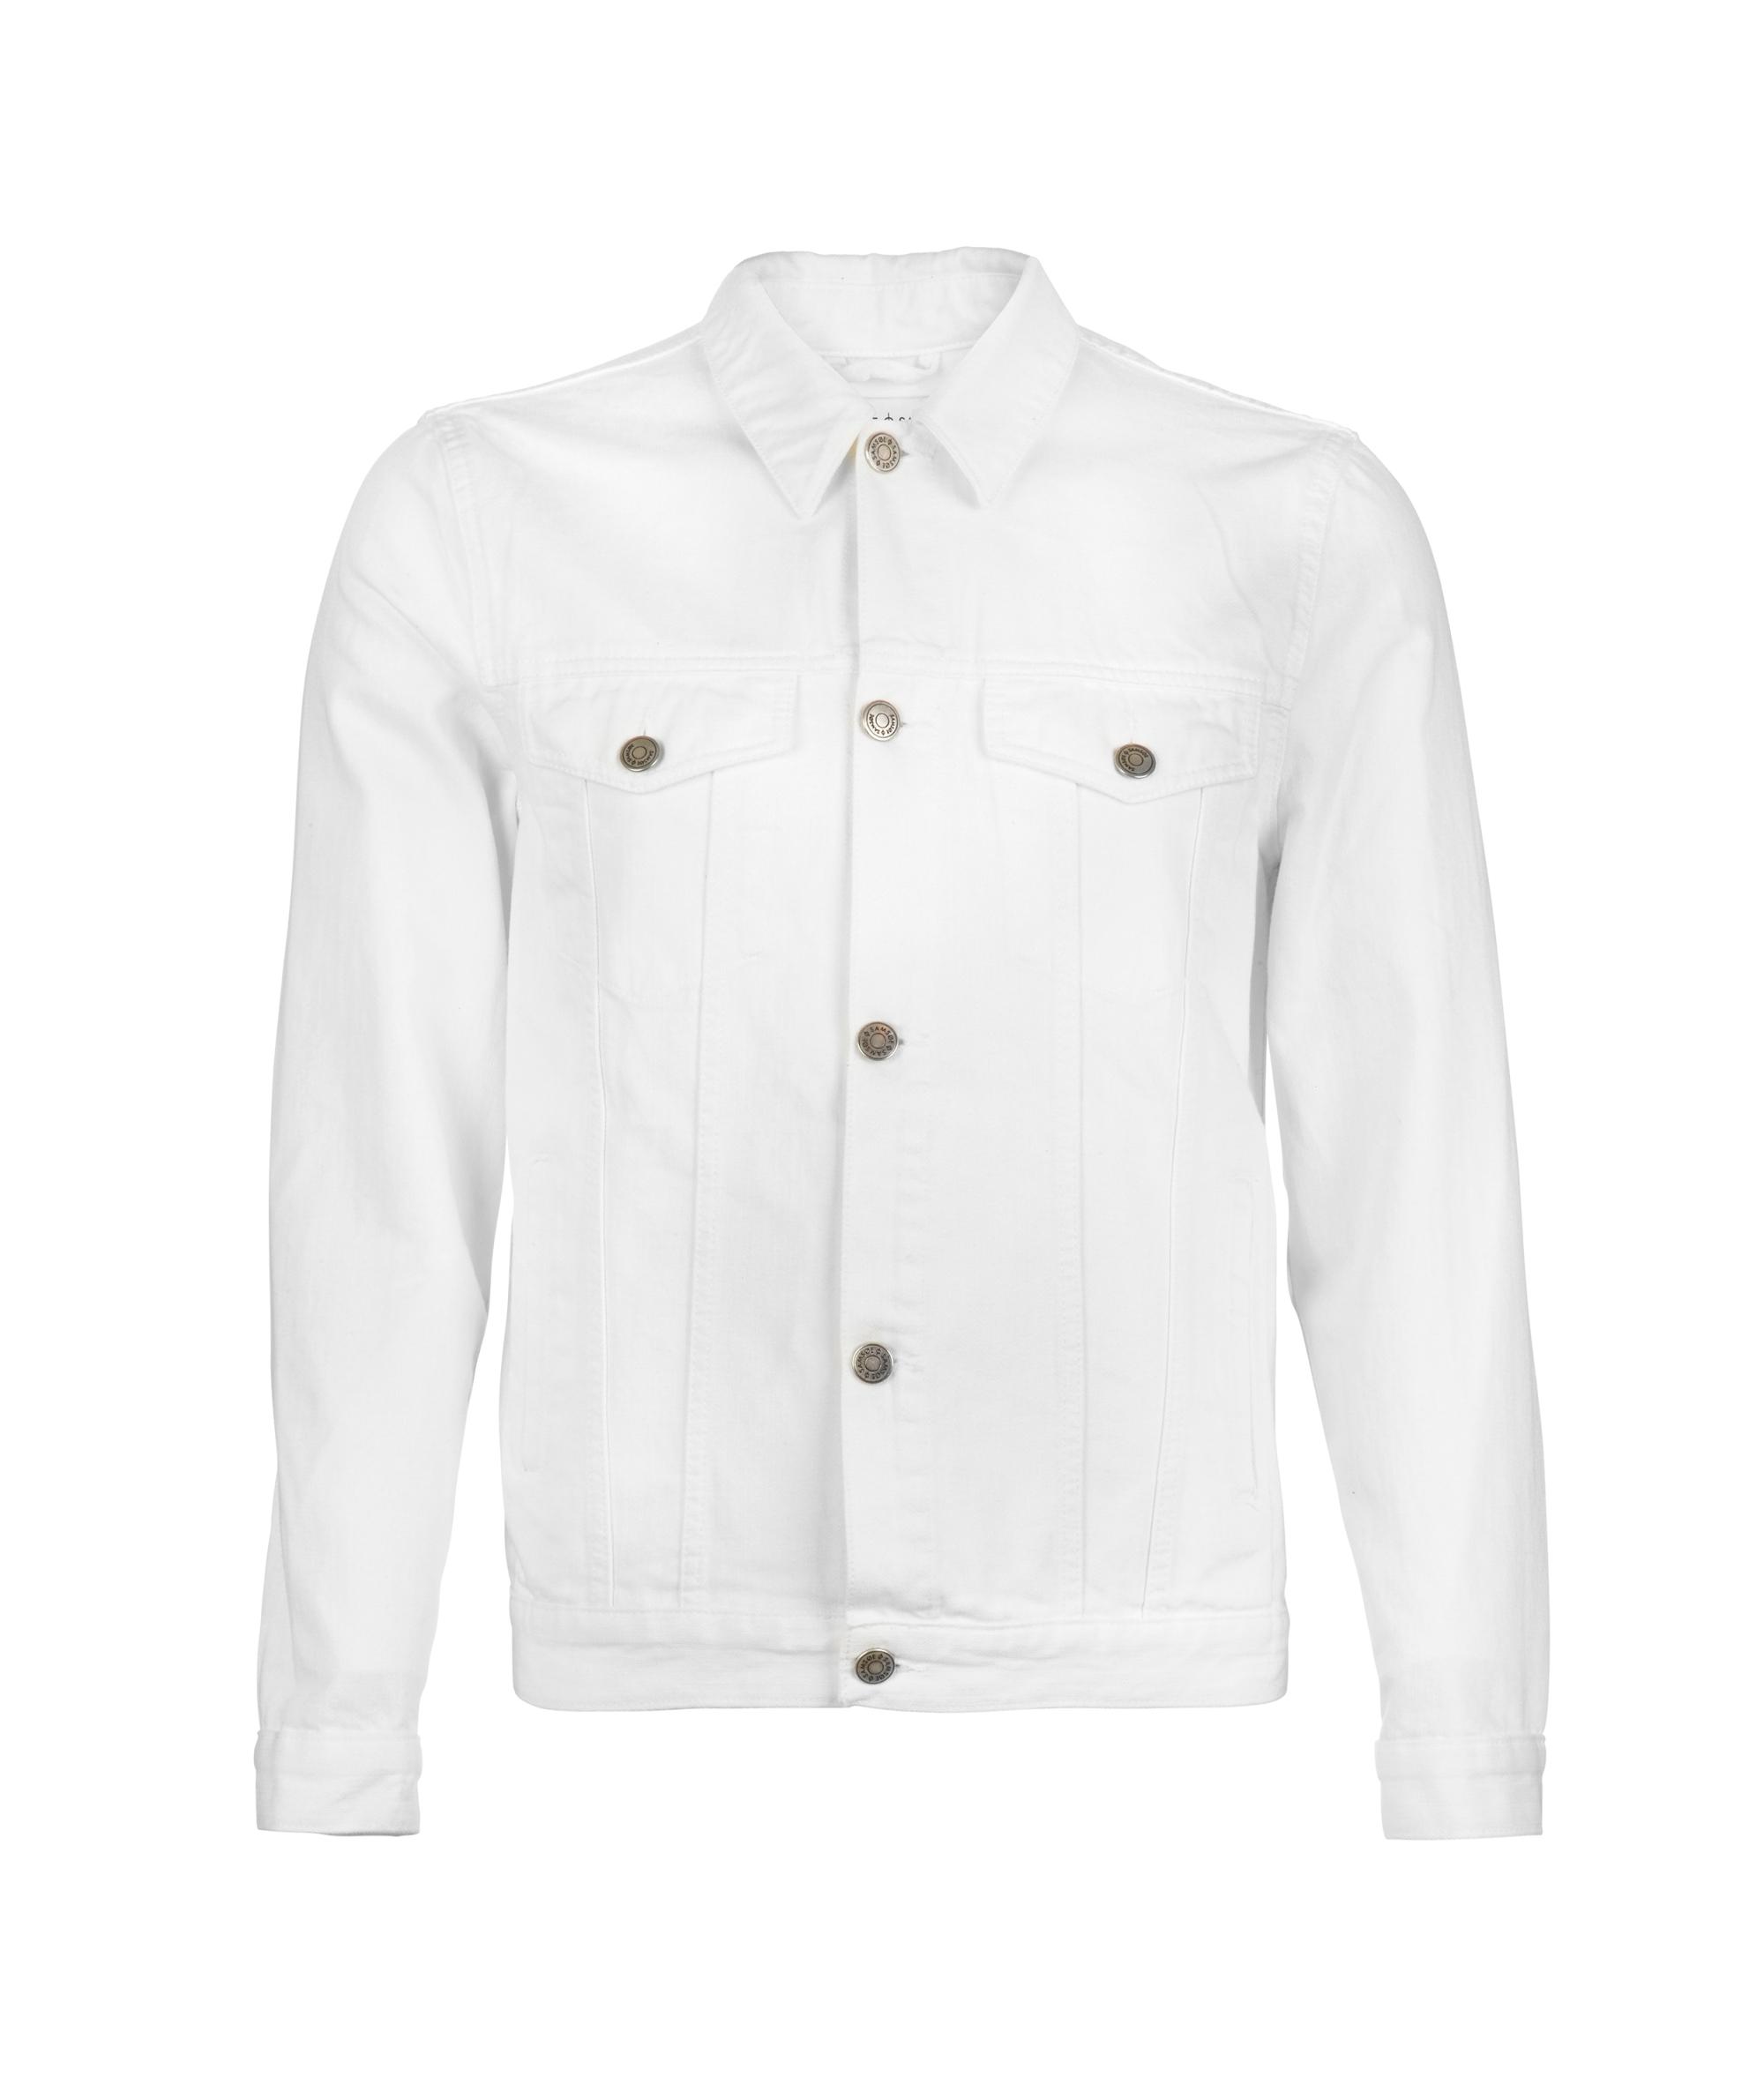 Laustjacket6209-white-3